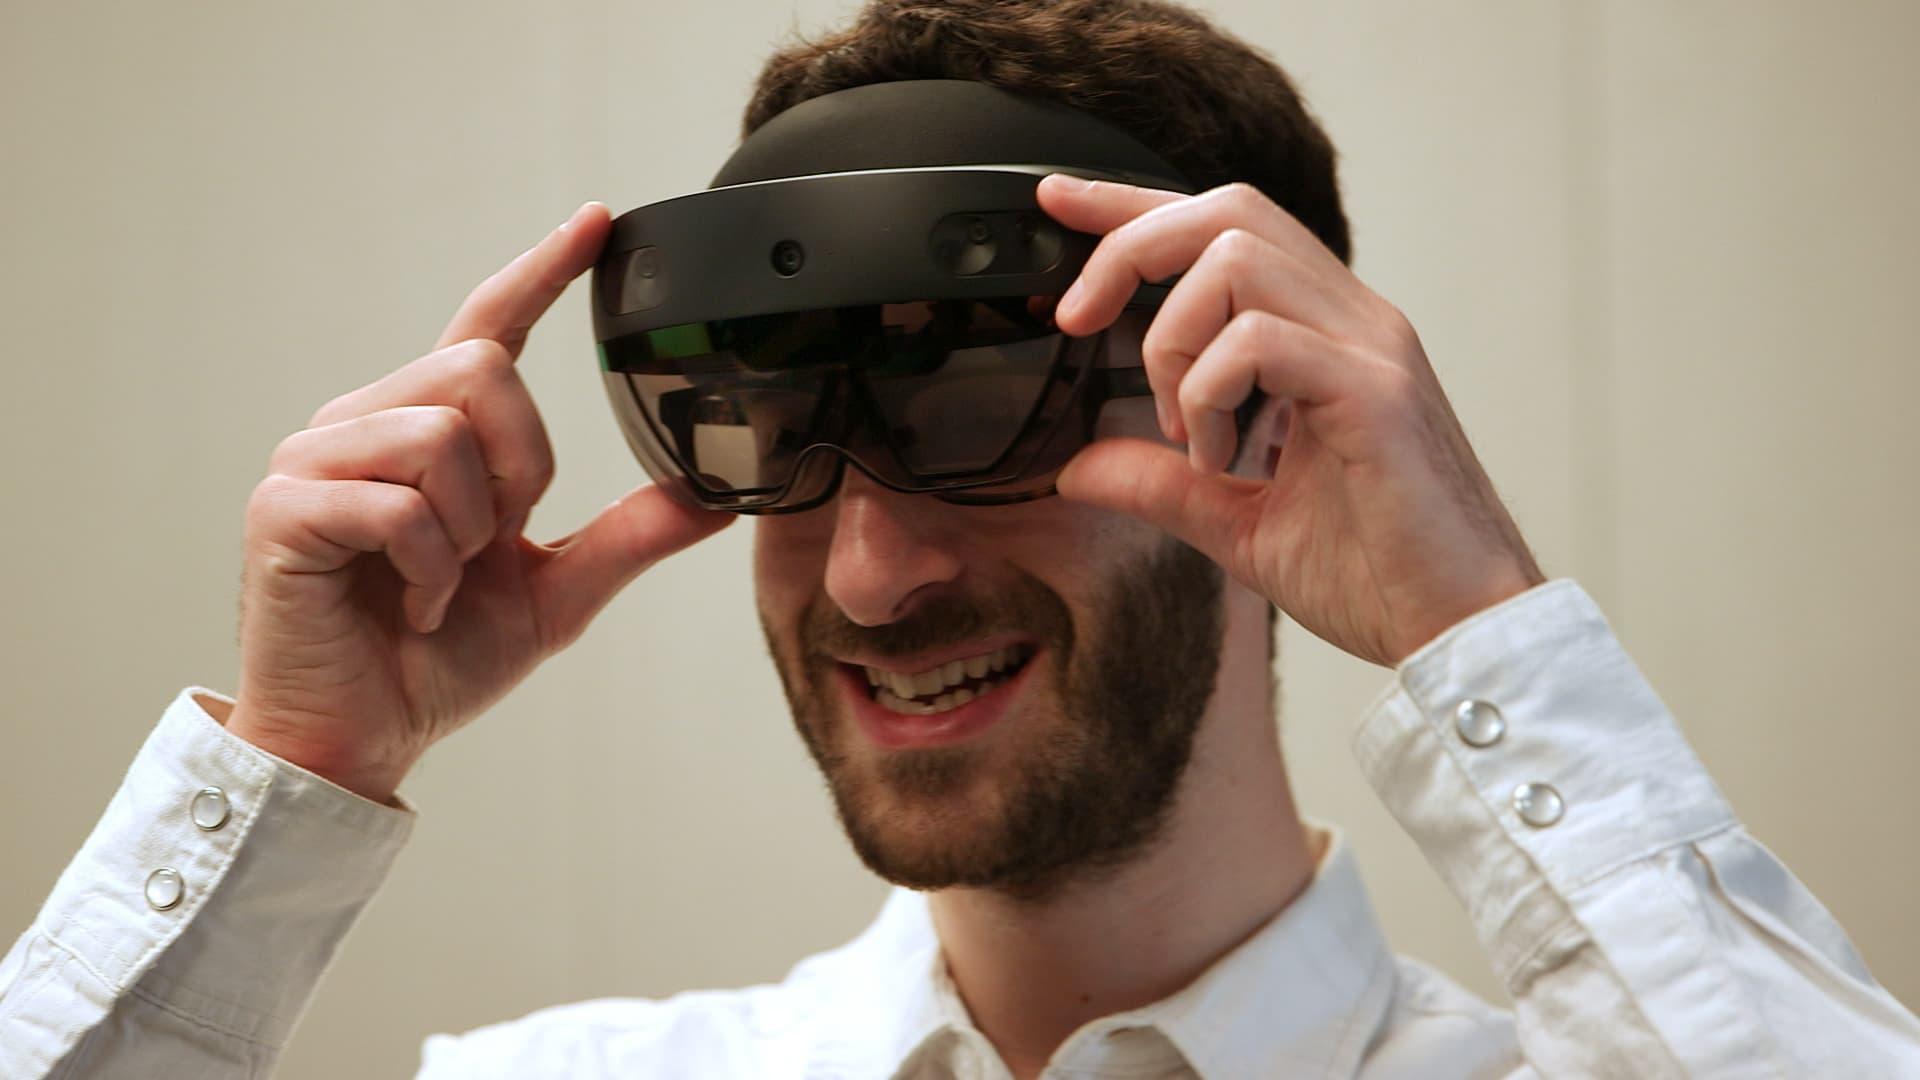 Microsoft's HoloLens 2.